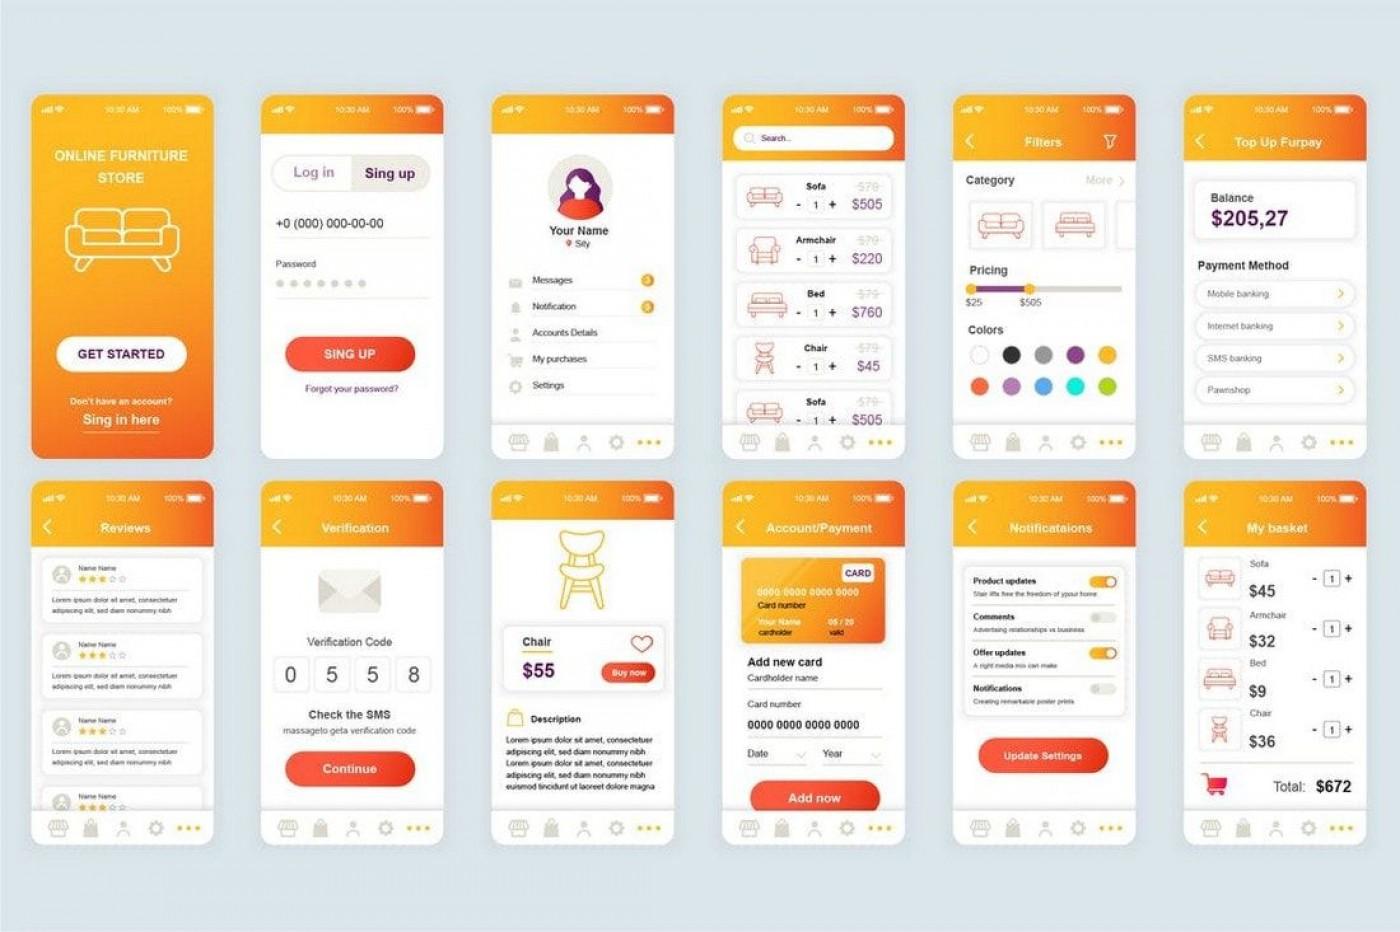 007 Fantastic Mobile App Design Template Image  Size Adobe Xd Ui Psd Free Download1400